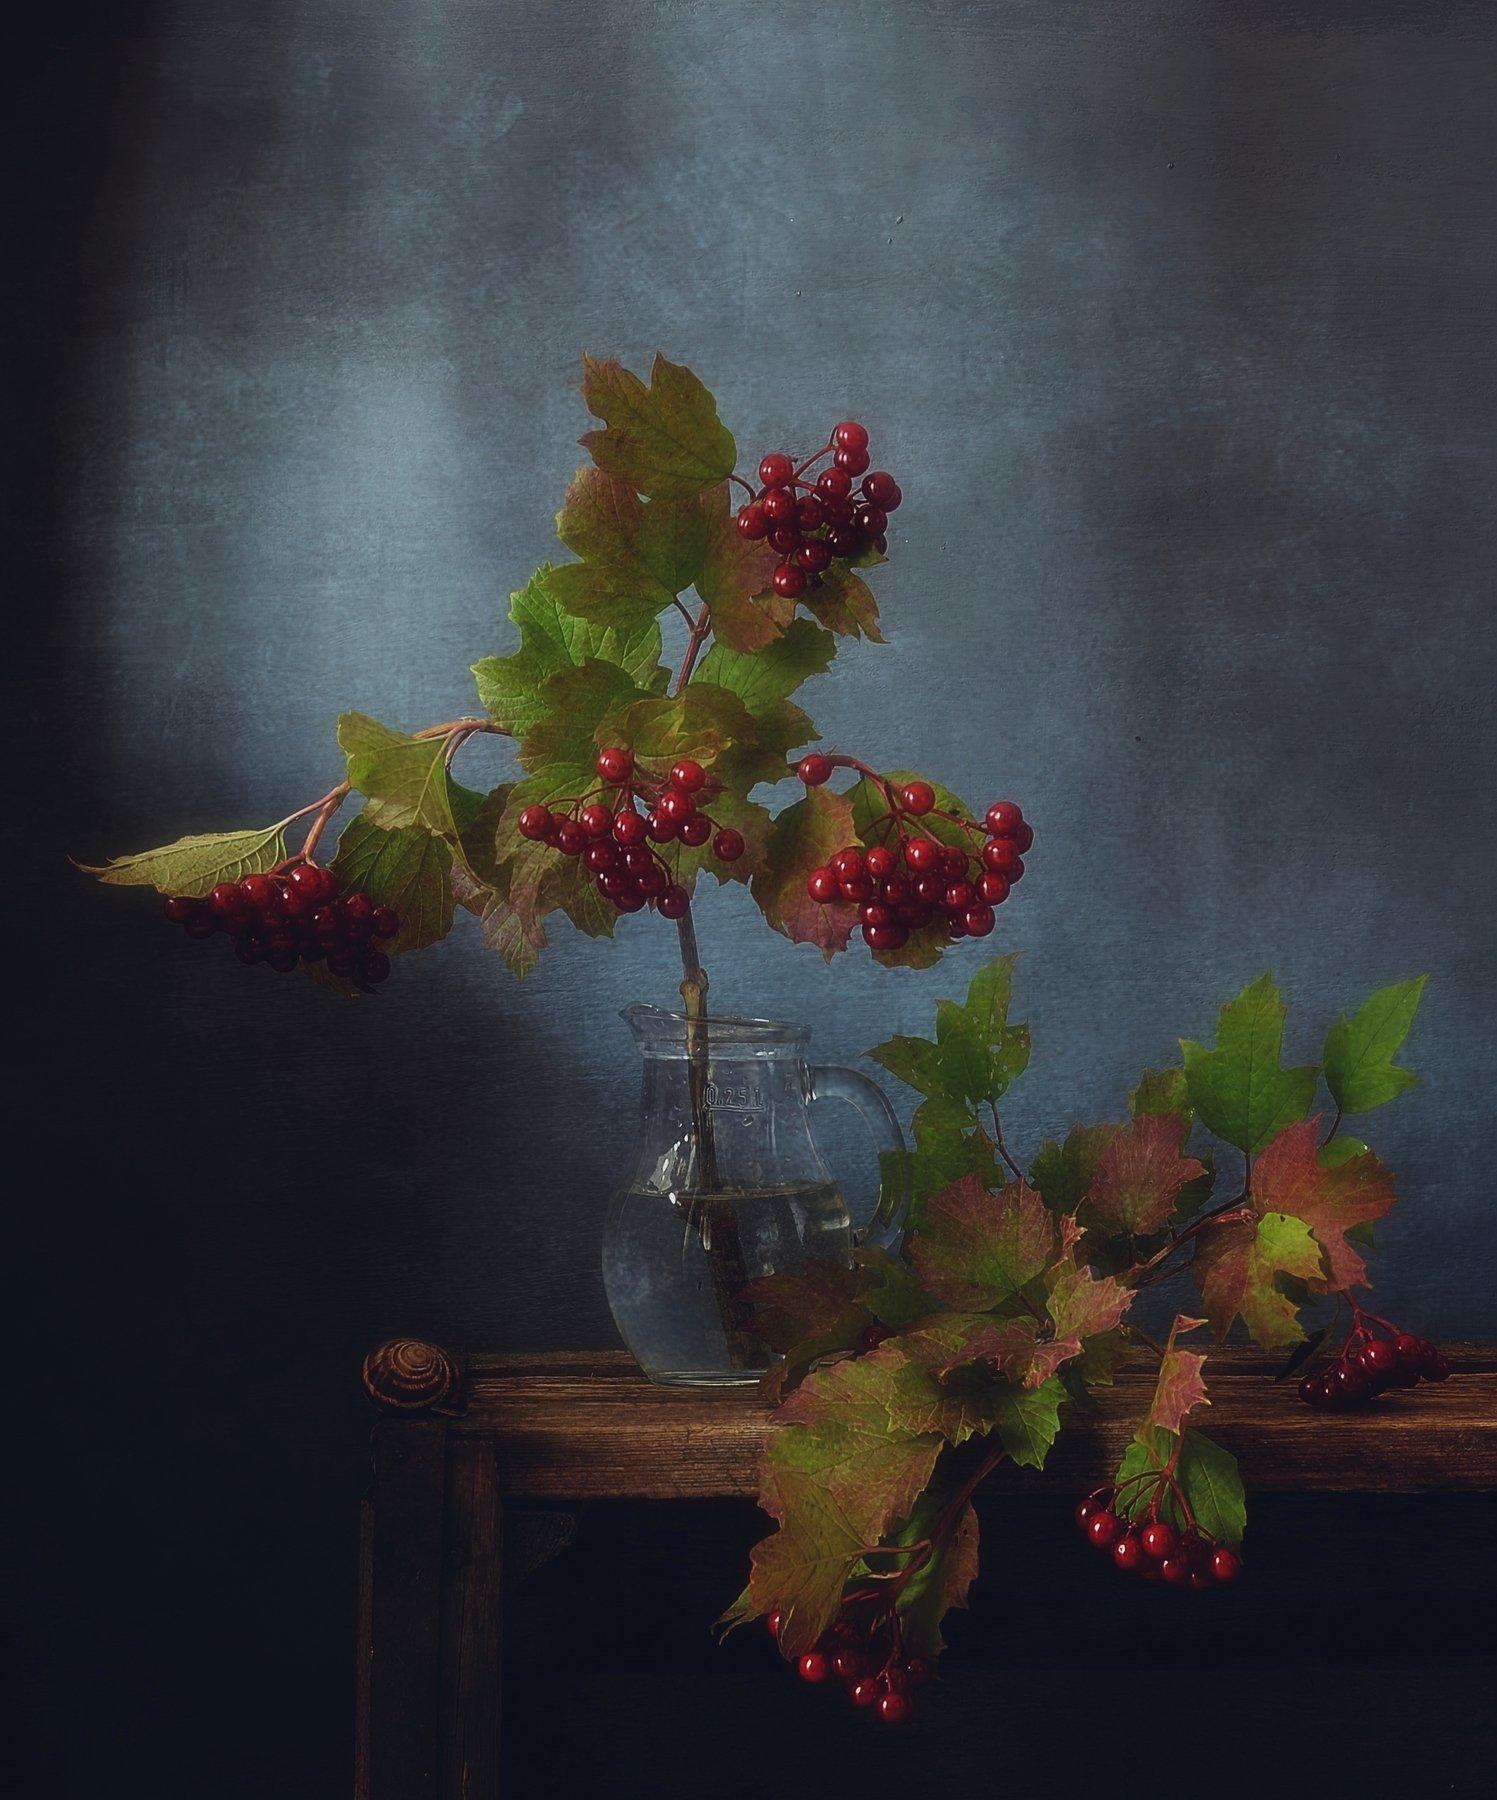 натюрморт,калина,ягоды,осень, Наталия К